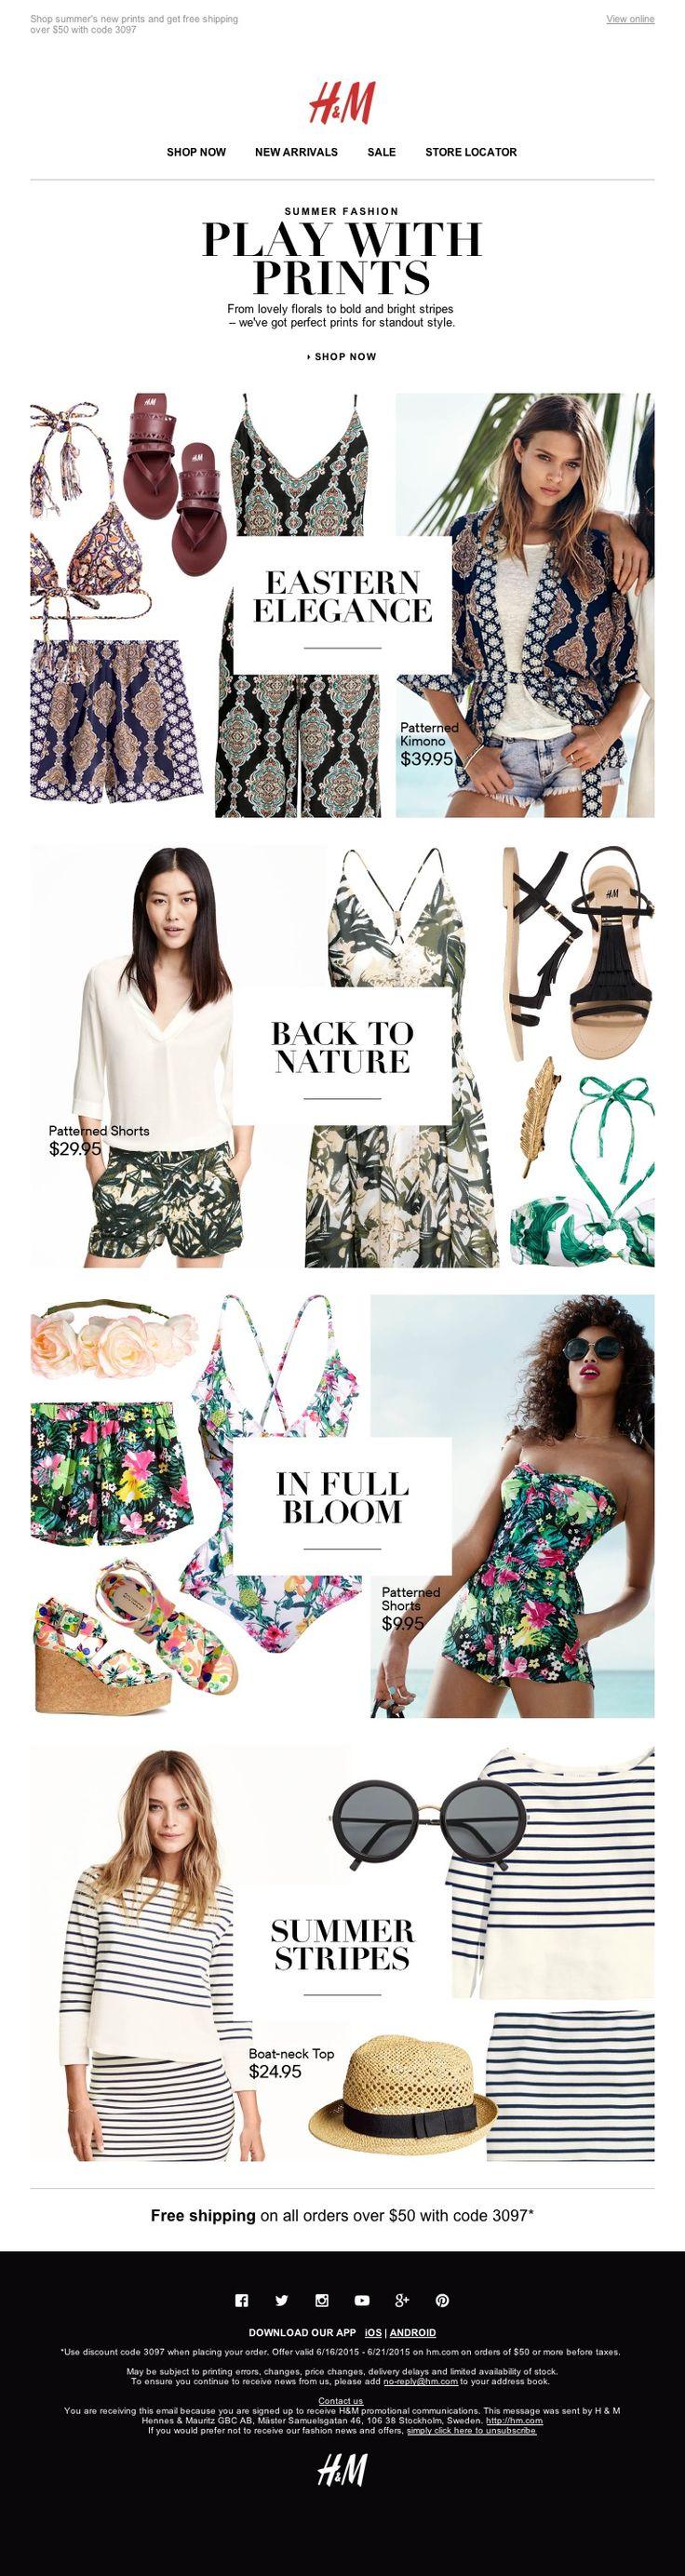 print email - H&M